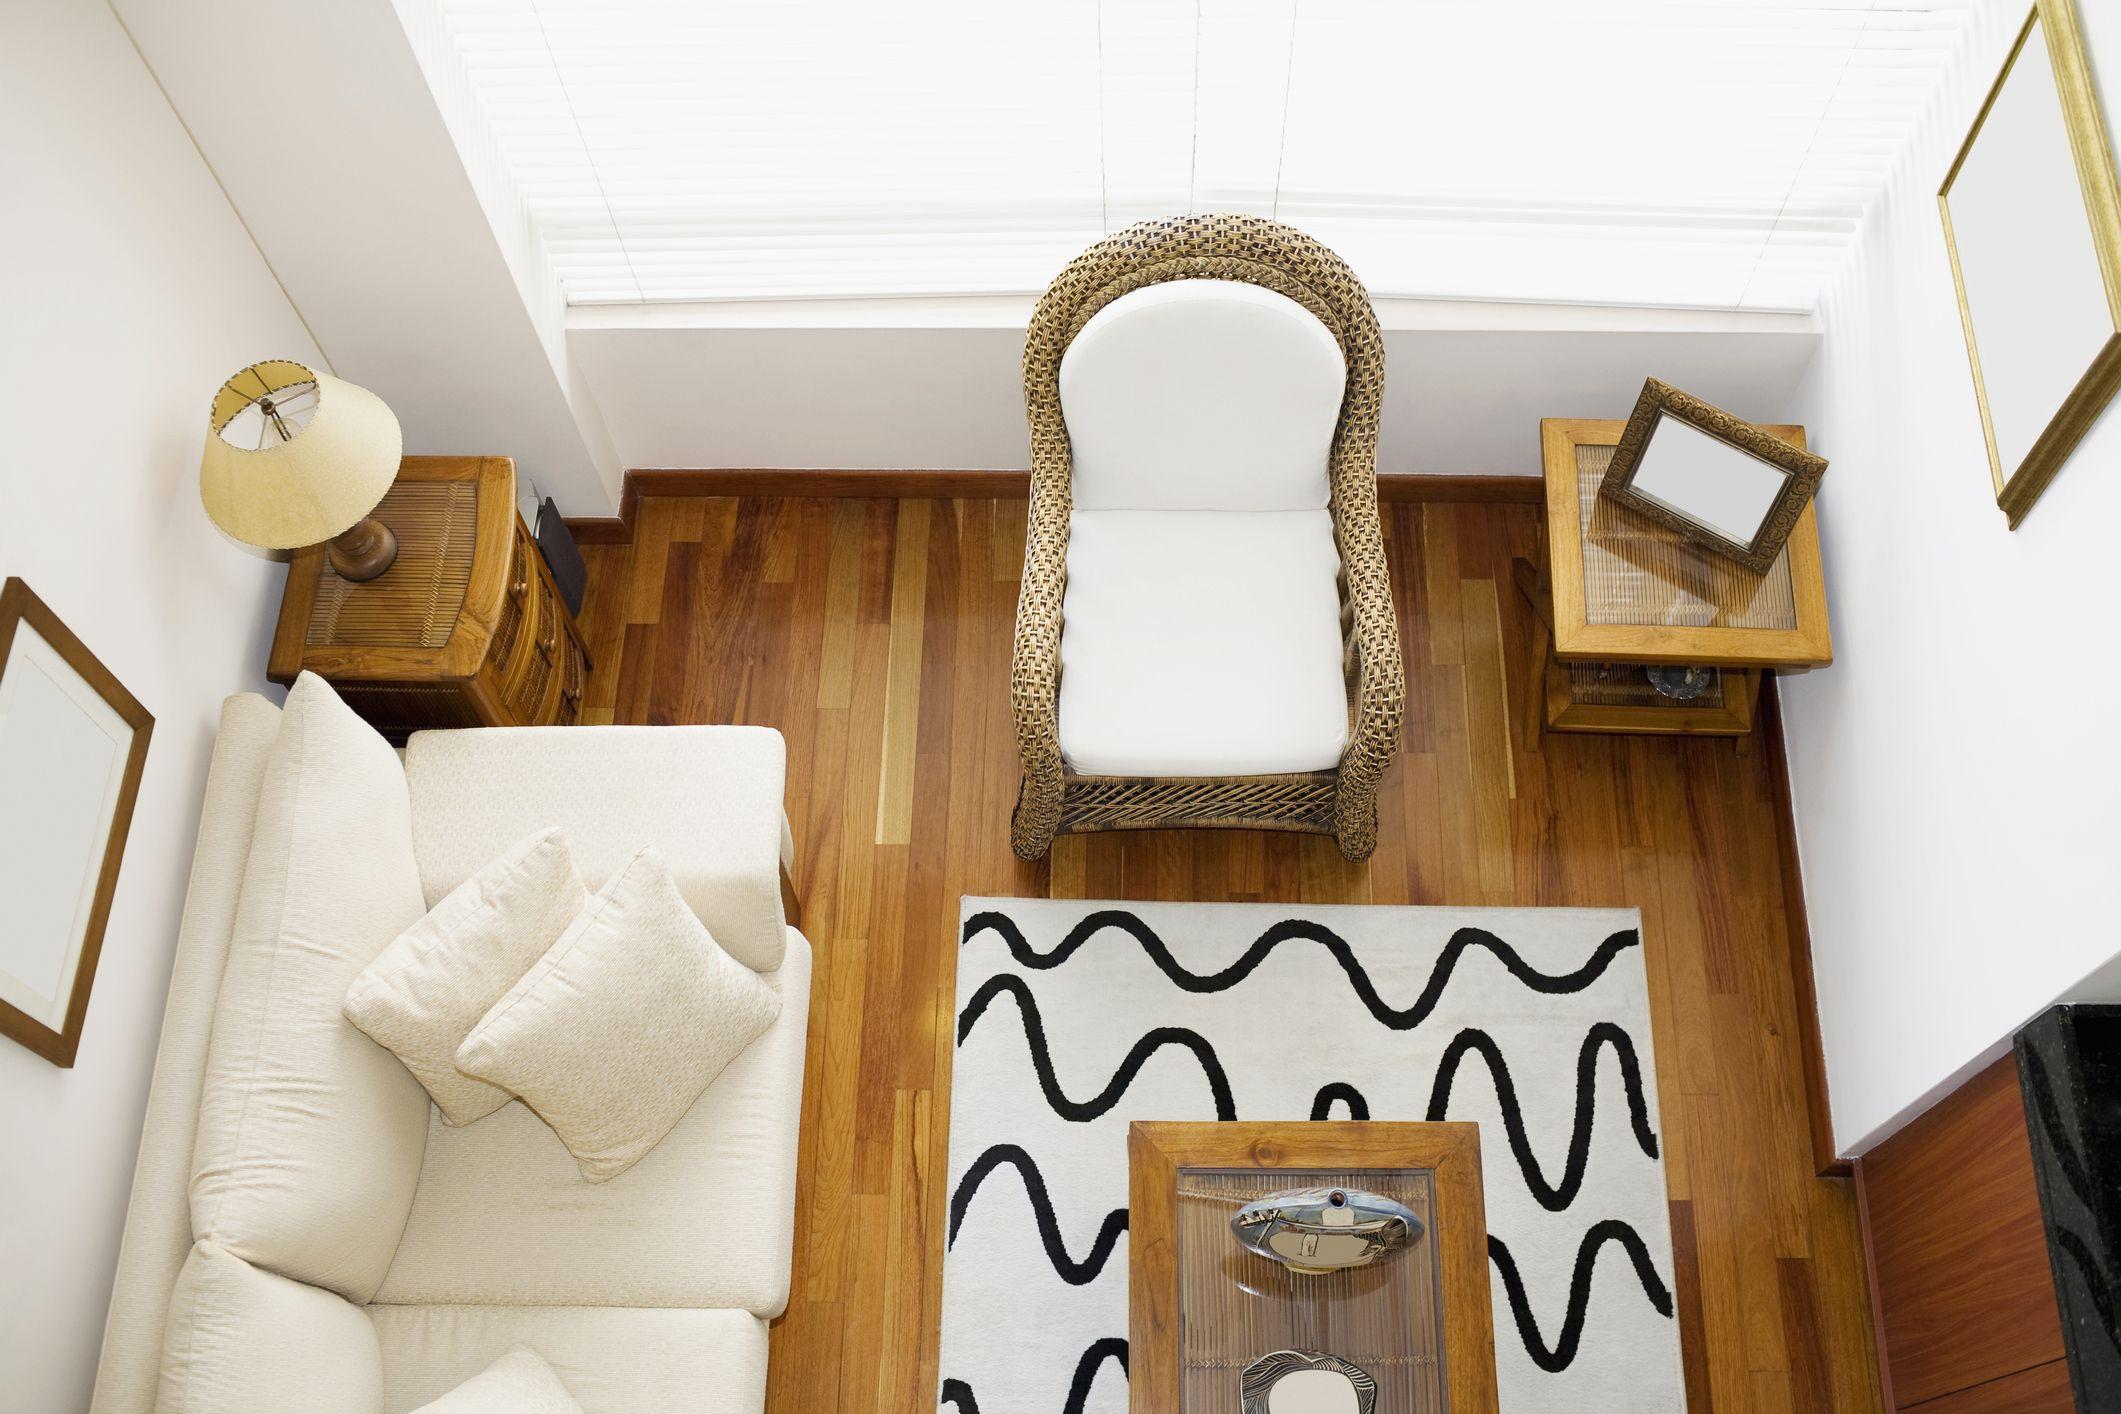 kitchen hardwood floors vs tile of stop putting hardwood floors in every room with 1480712606 hardwood floor rug